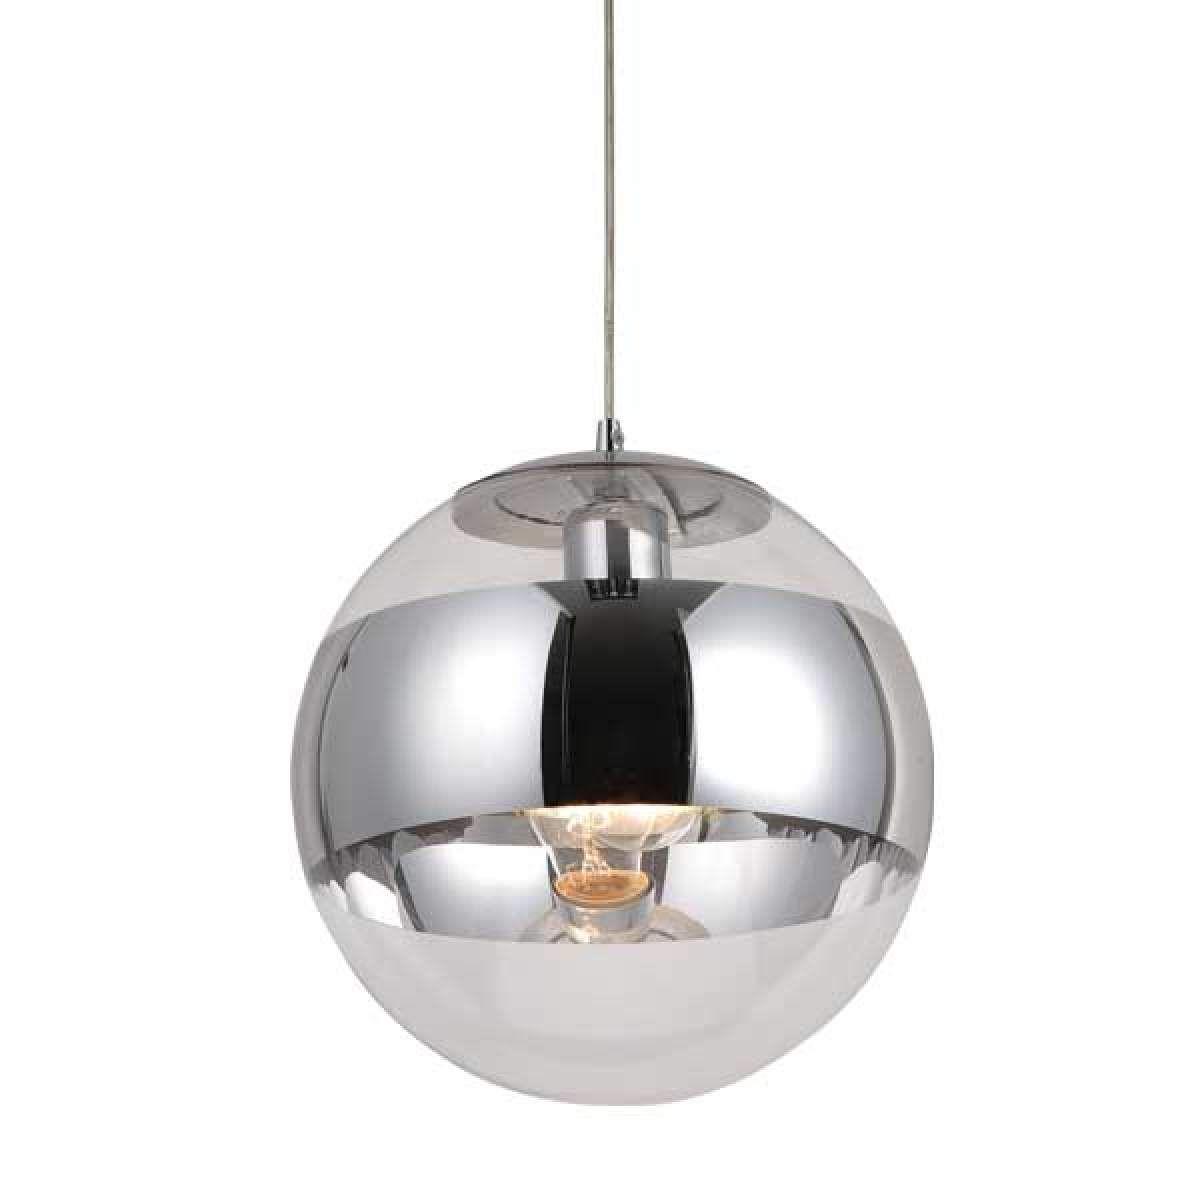 Lampe De Salon Orange Lampes ŕ Poser Fer Forge Fabricant De